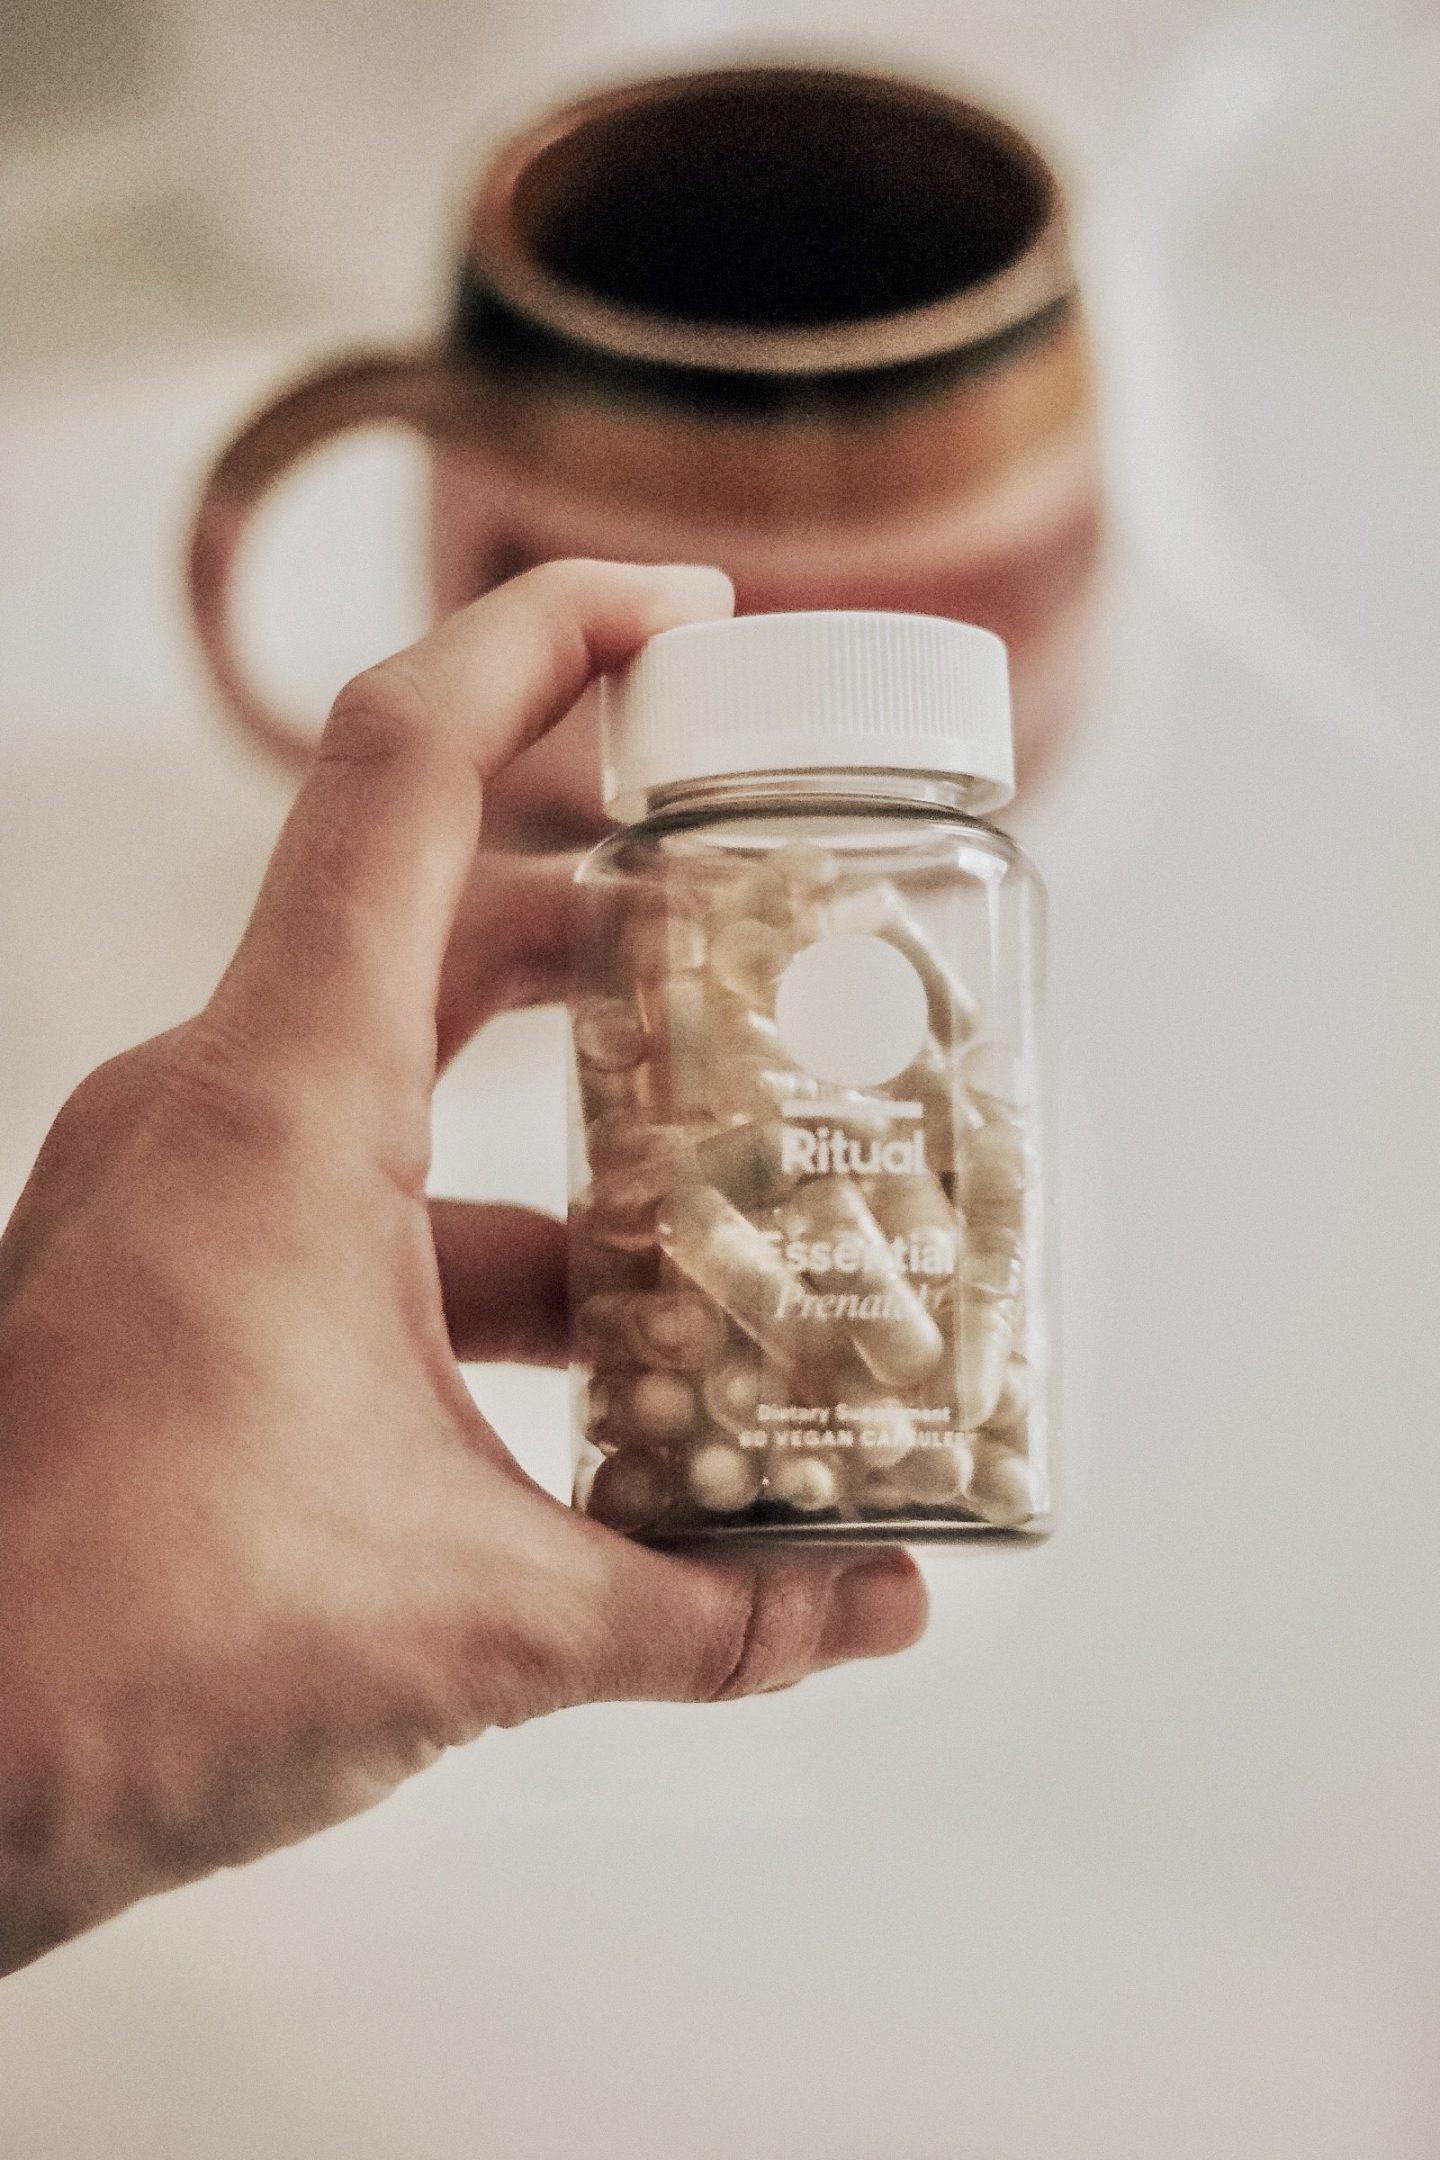 ritual essential prenatal vitamin